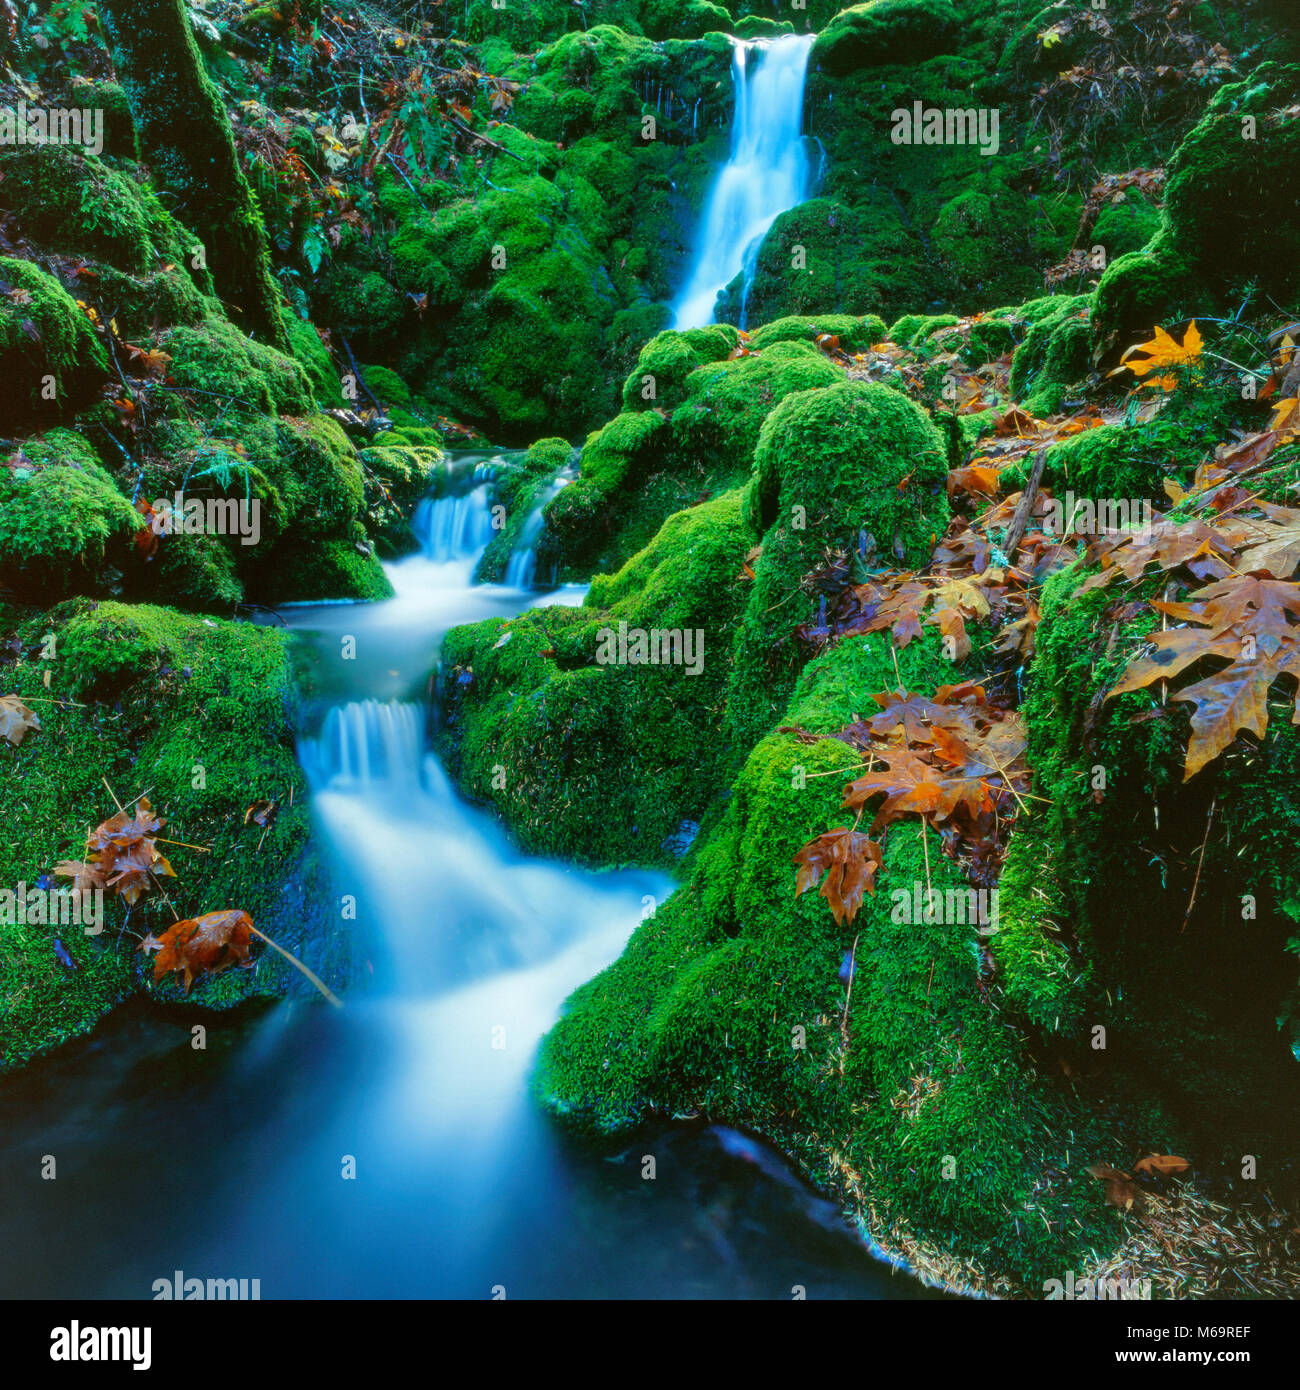 Moss Falls, Cataract Canyon, Mount Tamalpais, Marin County, California - Stock Image